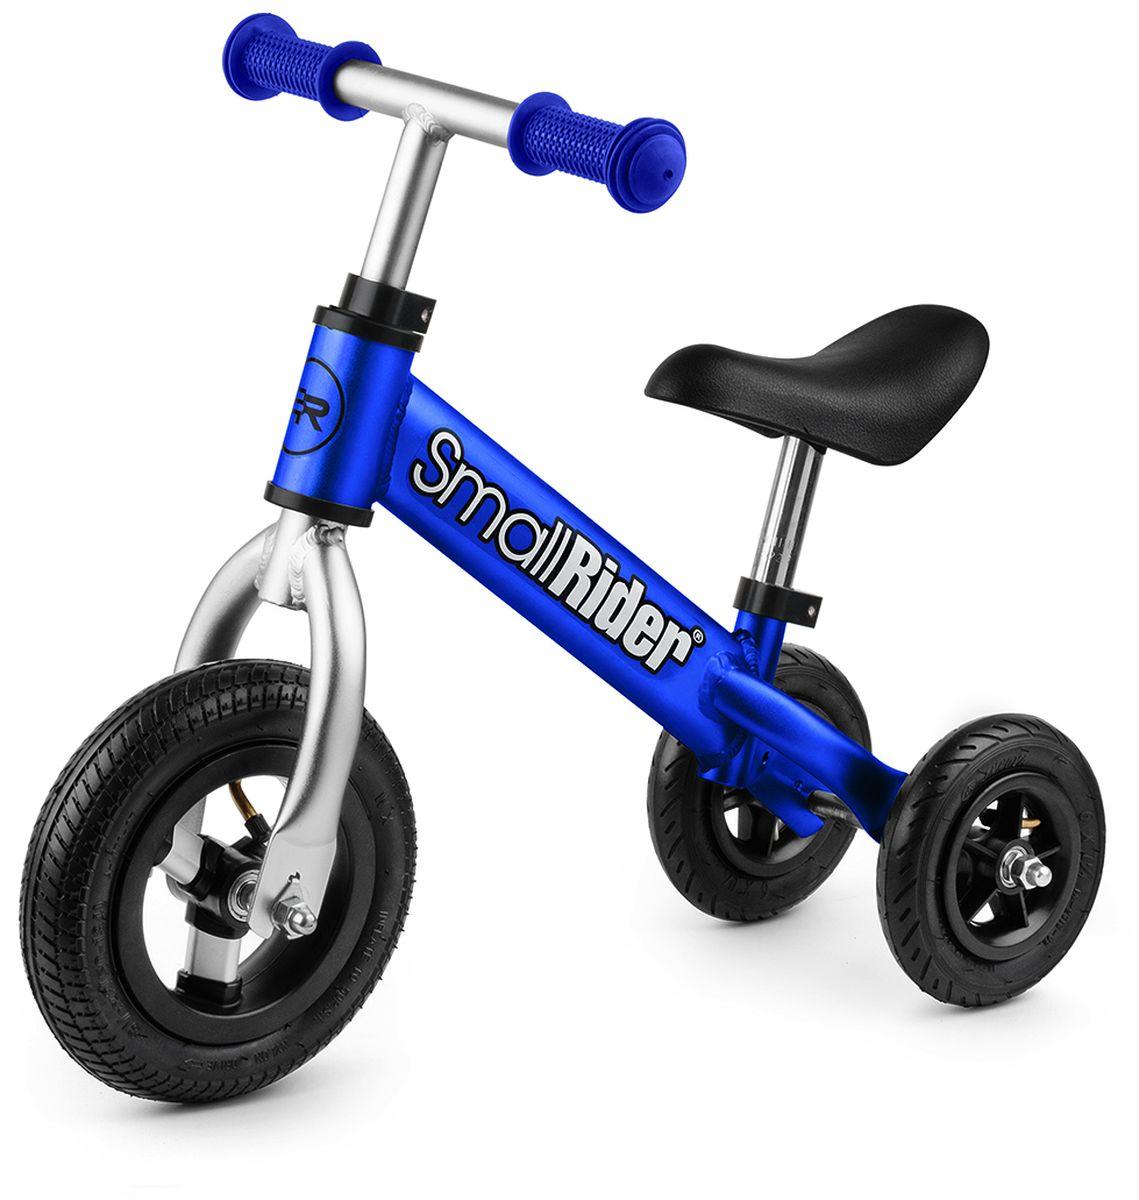 Small Rider Беговел-каталка для малышей Jimmy цвет синий - Беговелы